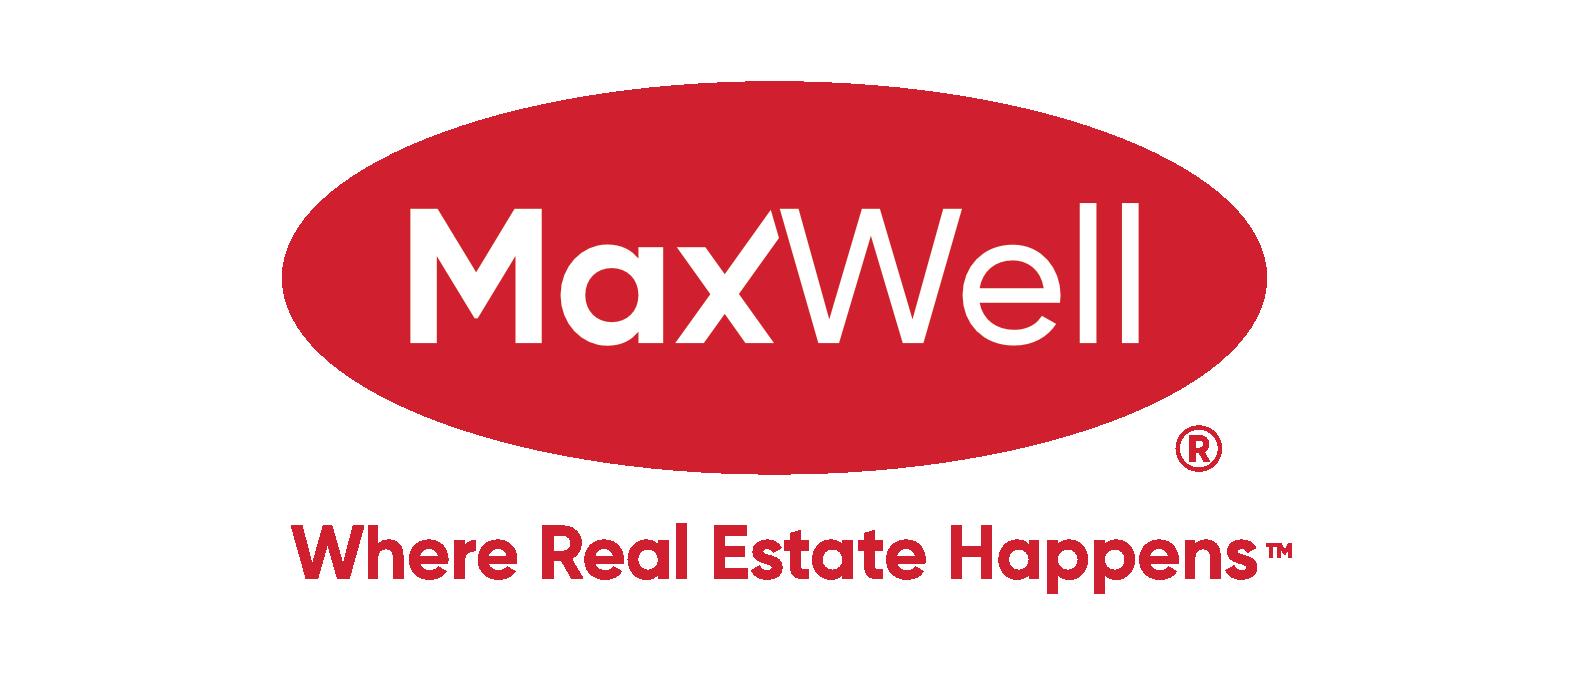 MaxWell Realty Inc. logo